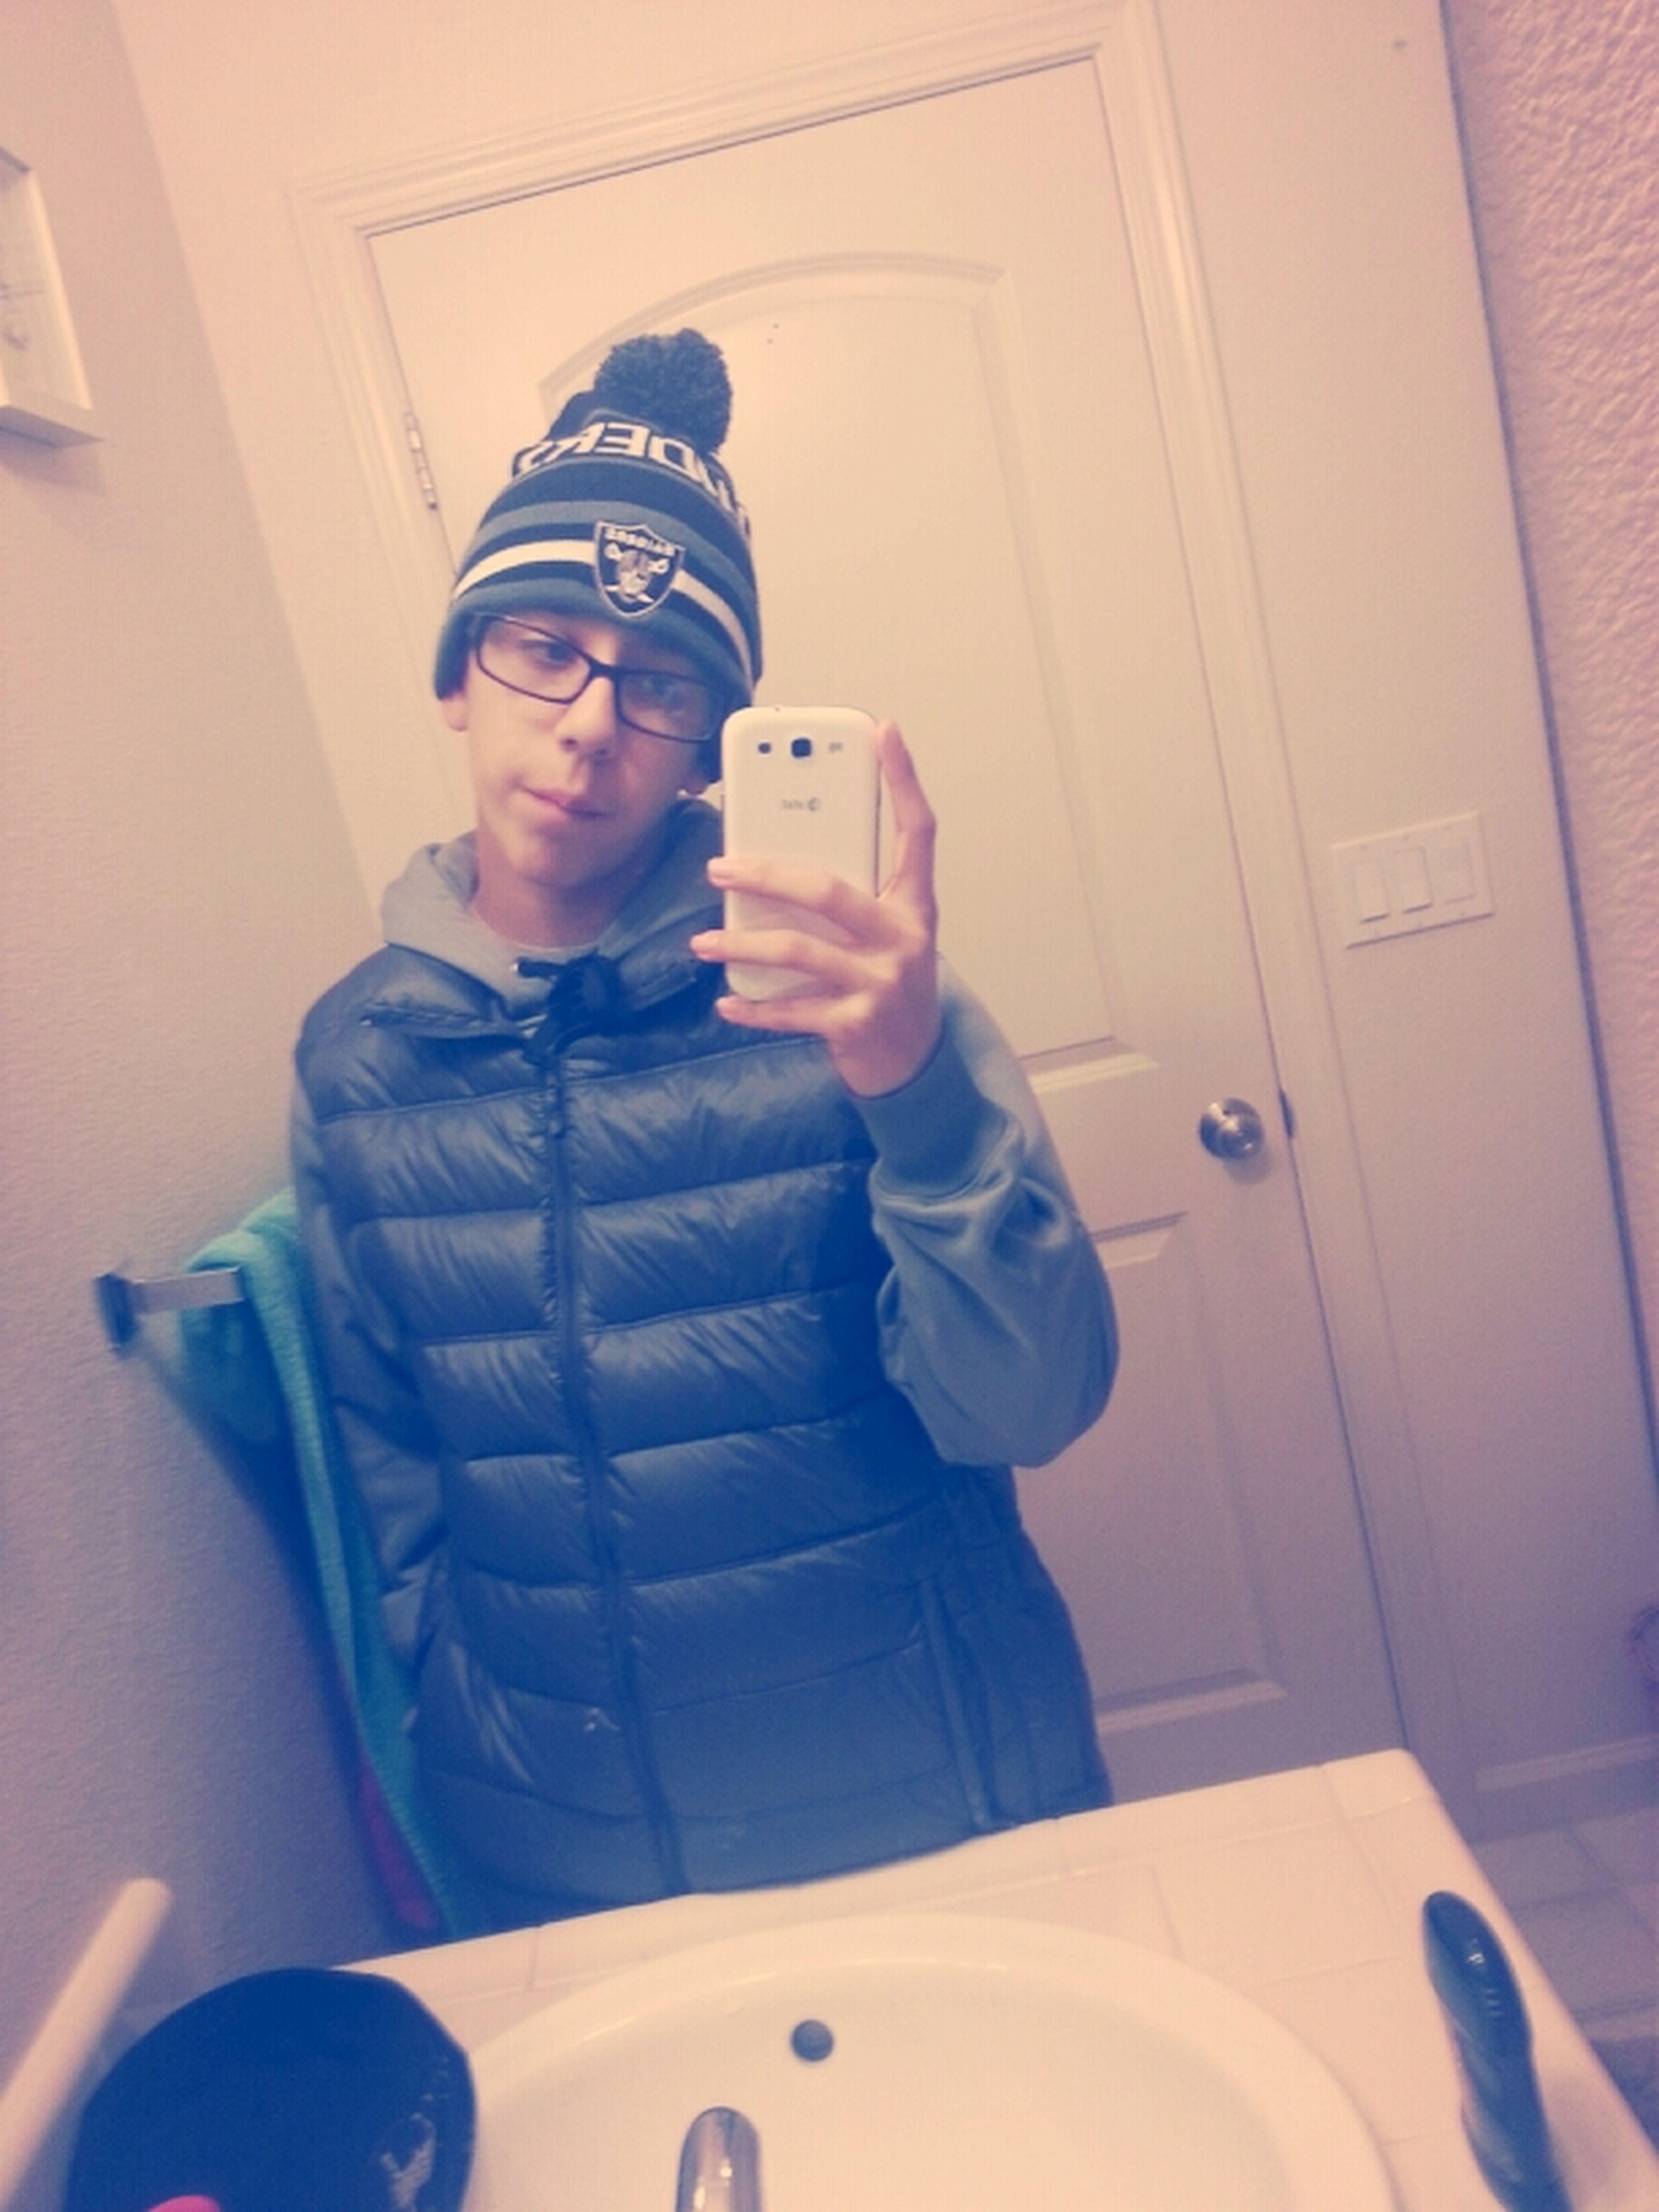 Chillin Cause Im A Thug.